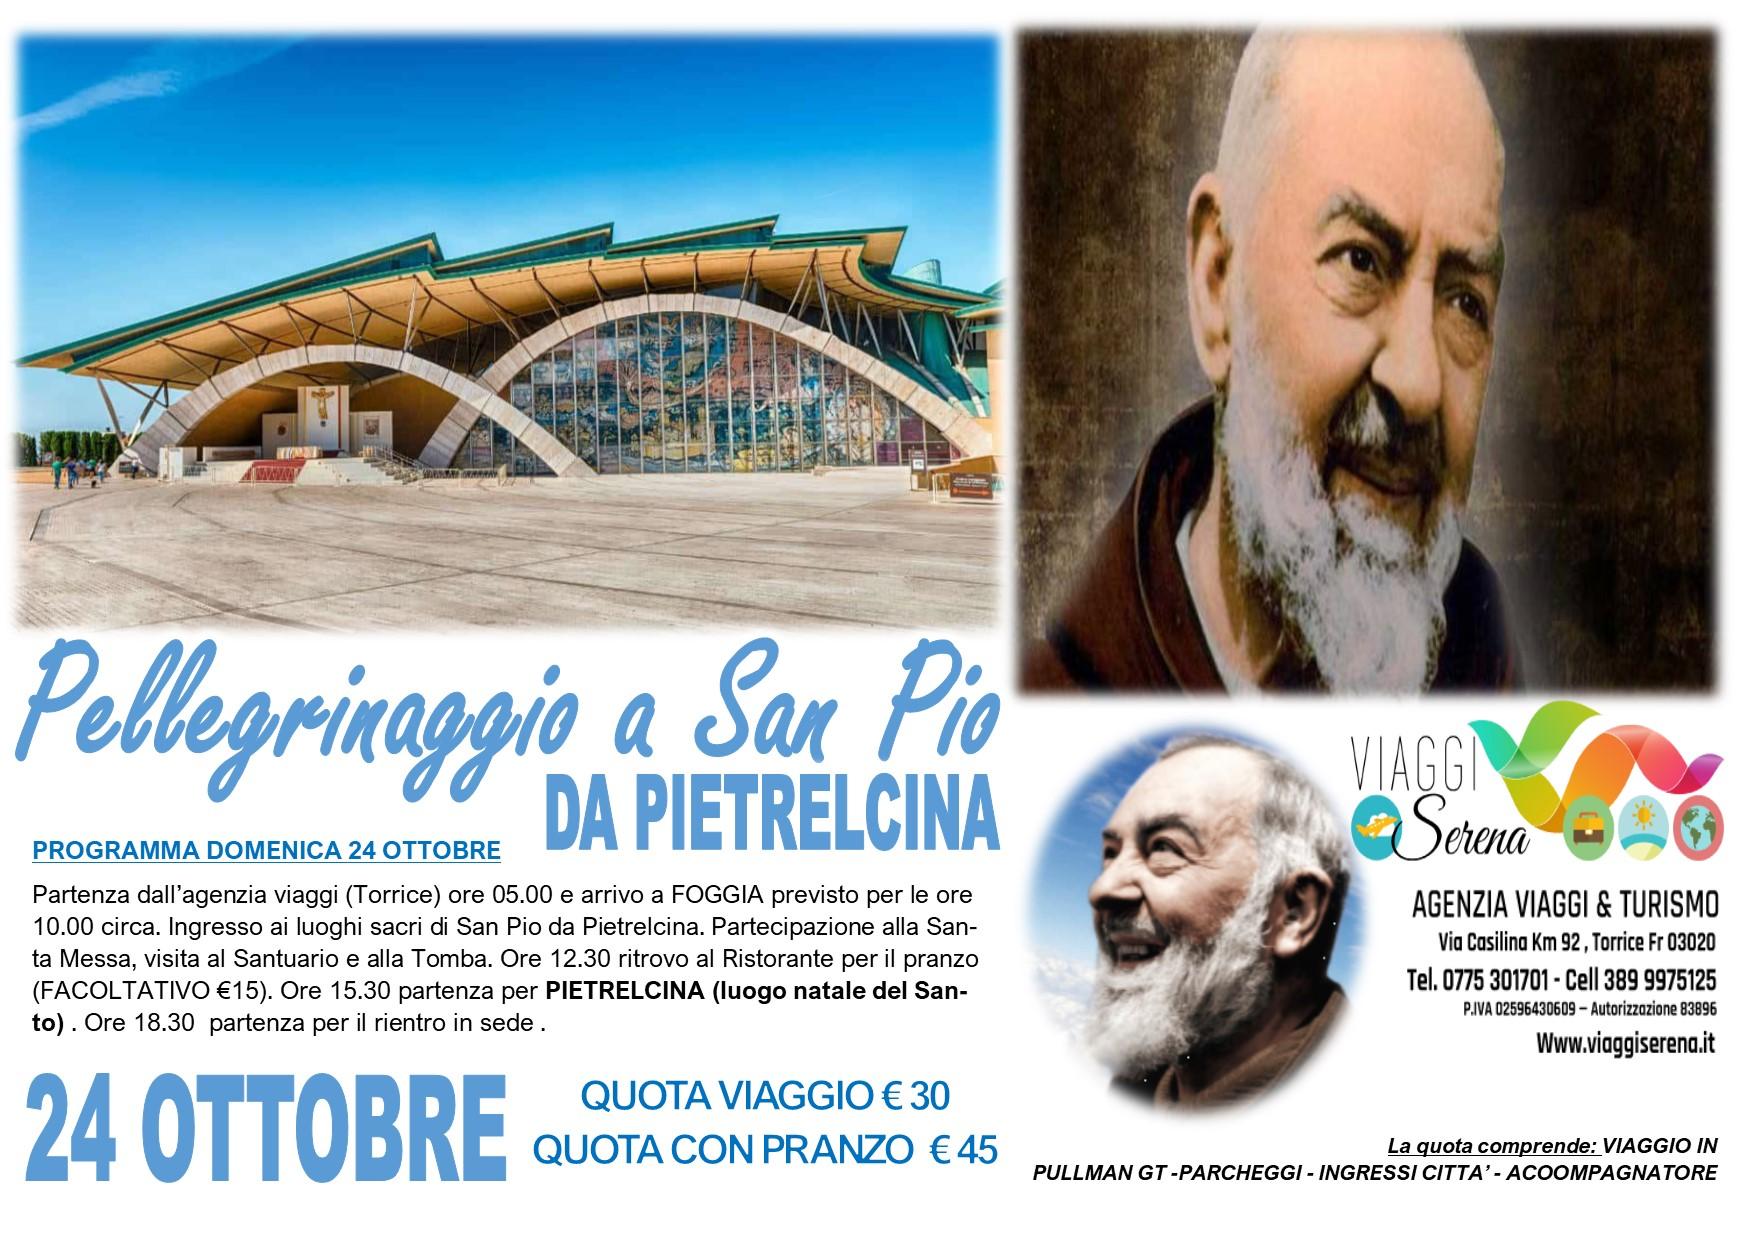 Viaggi di Gruppo: San PIO da PIETRELCINA 24 Ottobre  € 30,00